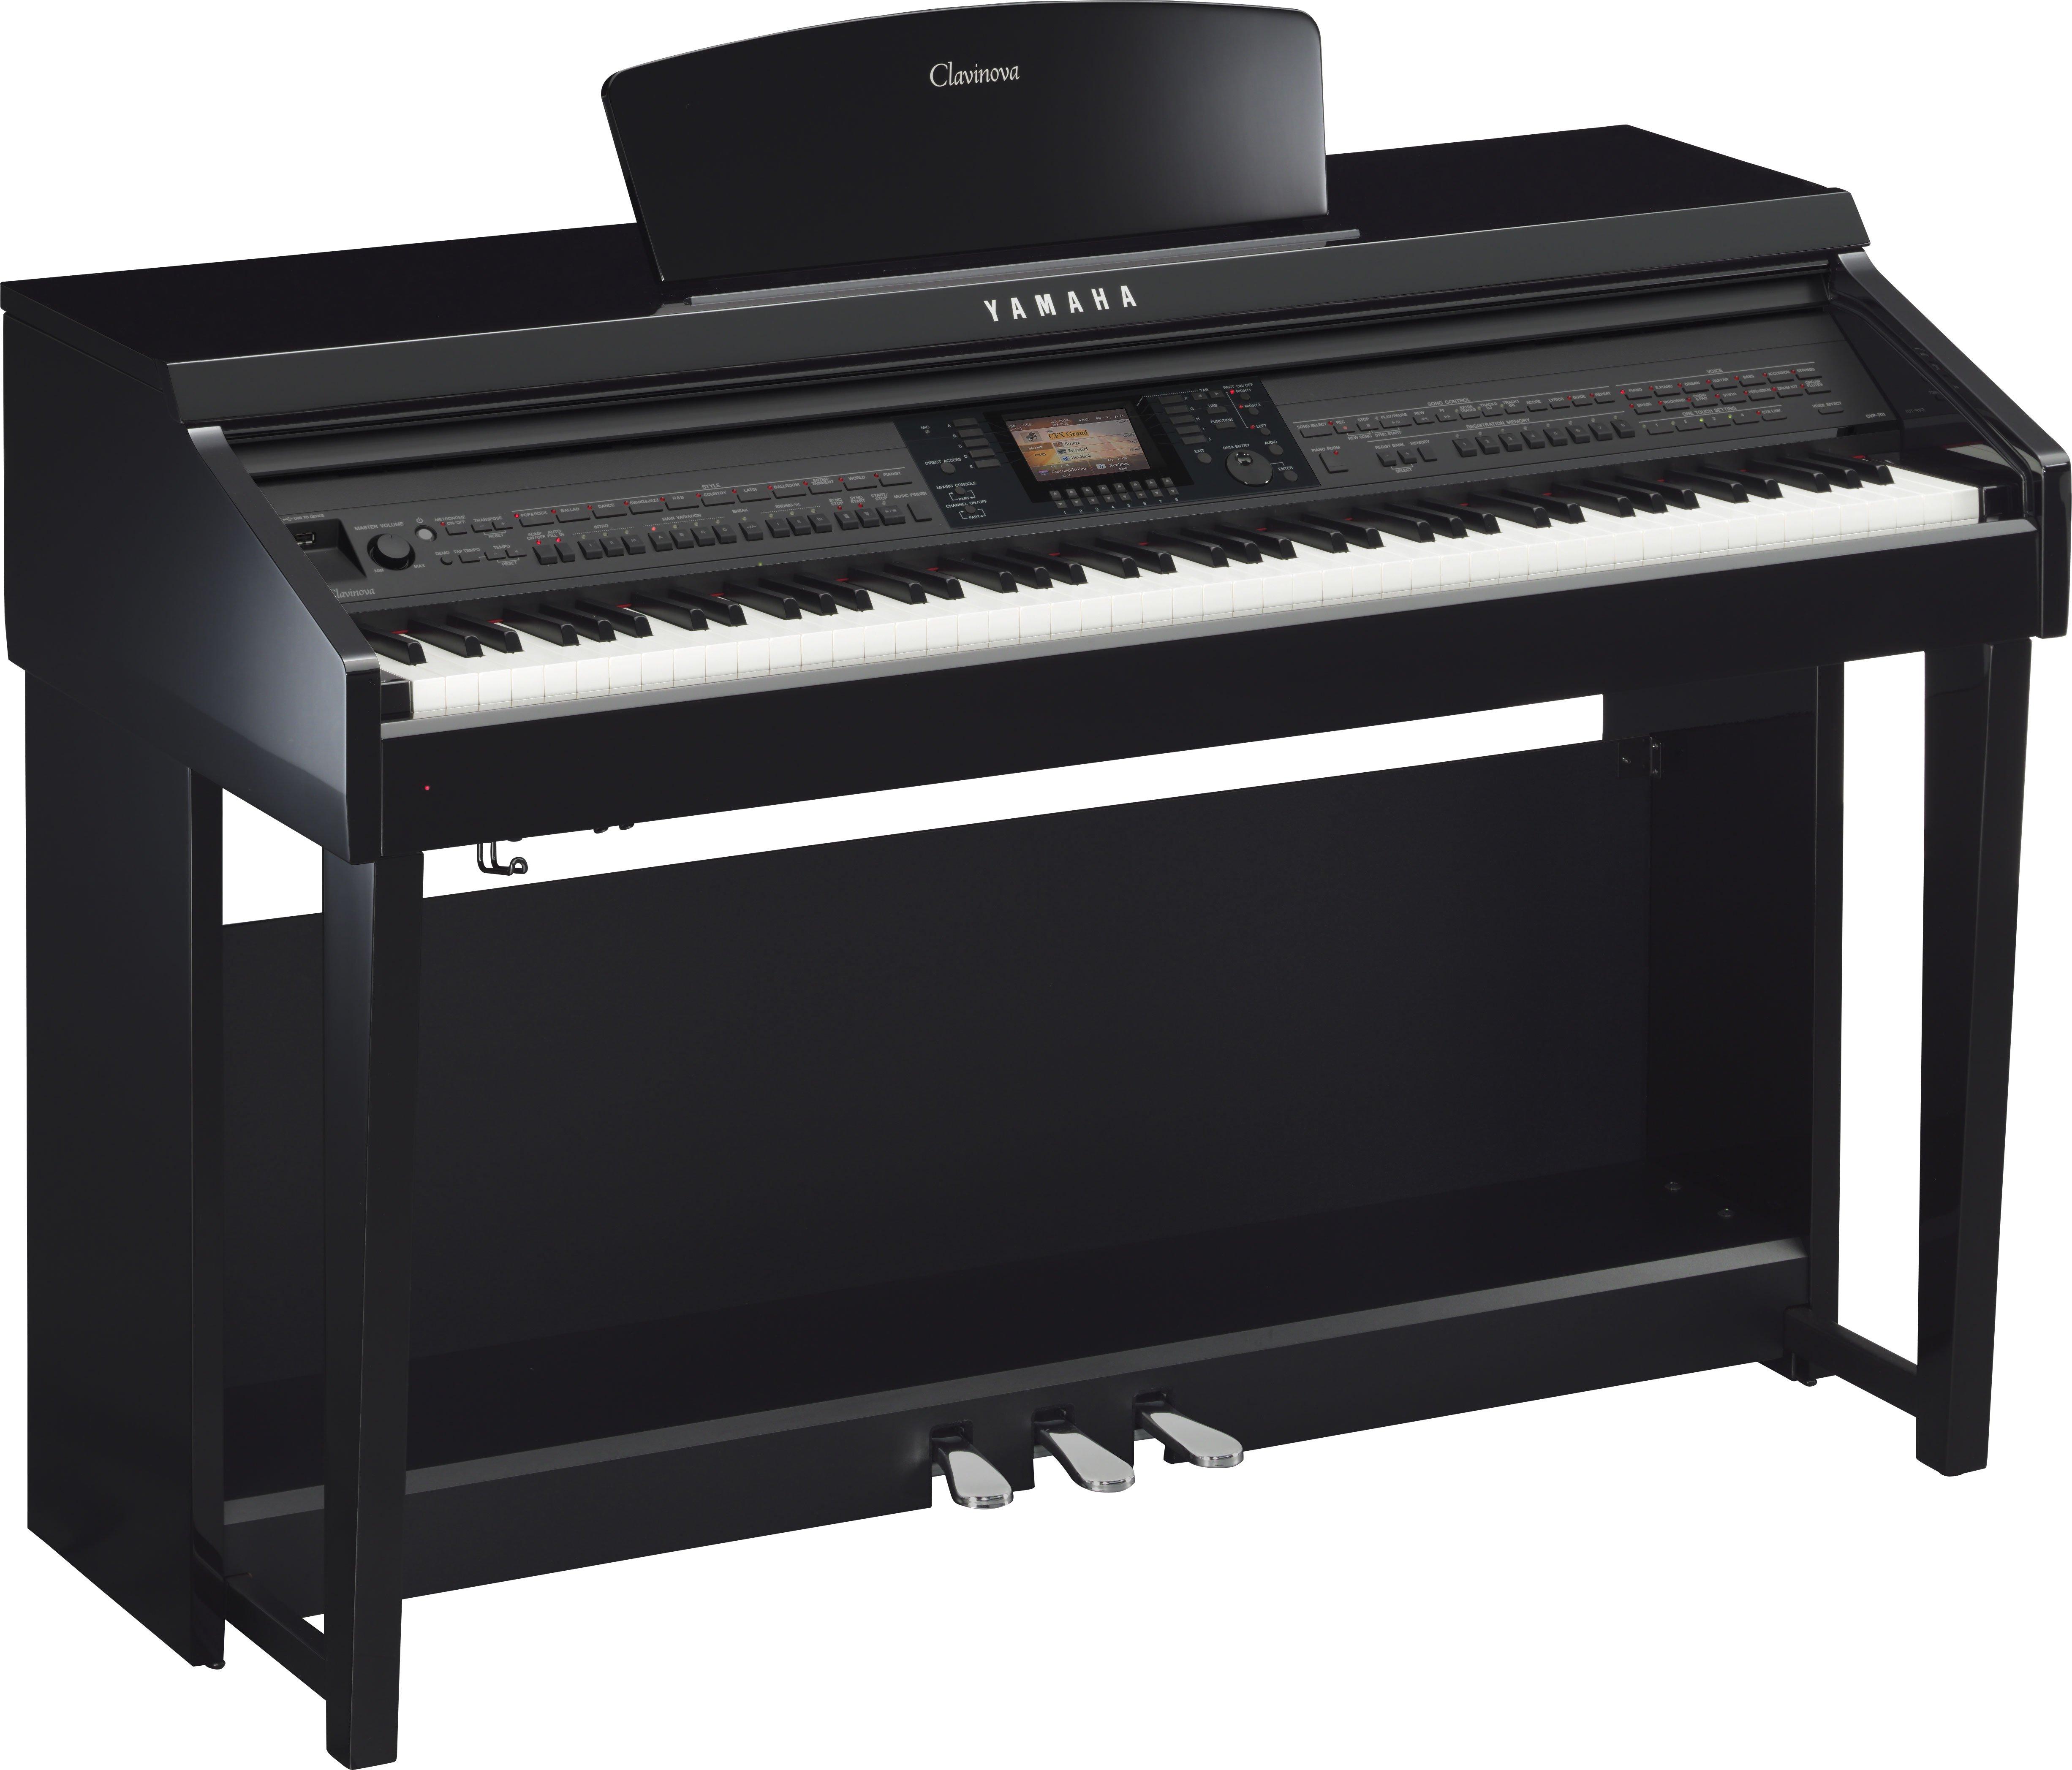 Yamaha Clavinova CVP701 (Polished Ebony) - Includes FREE Delivery (Digital Piano)